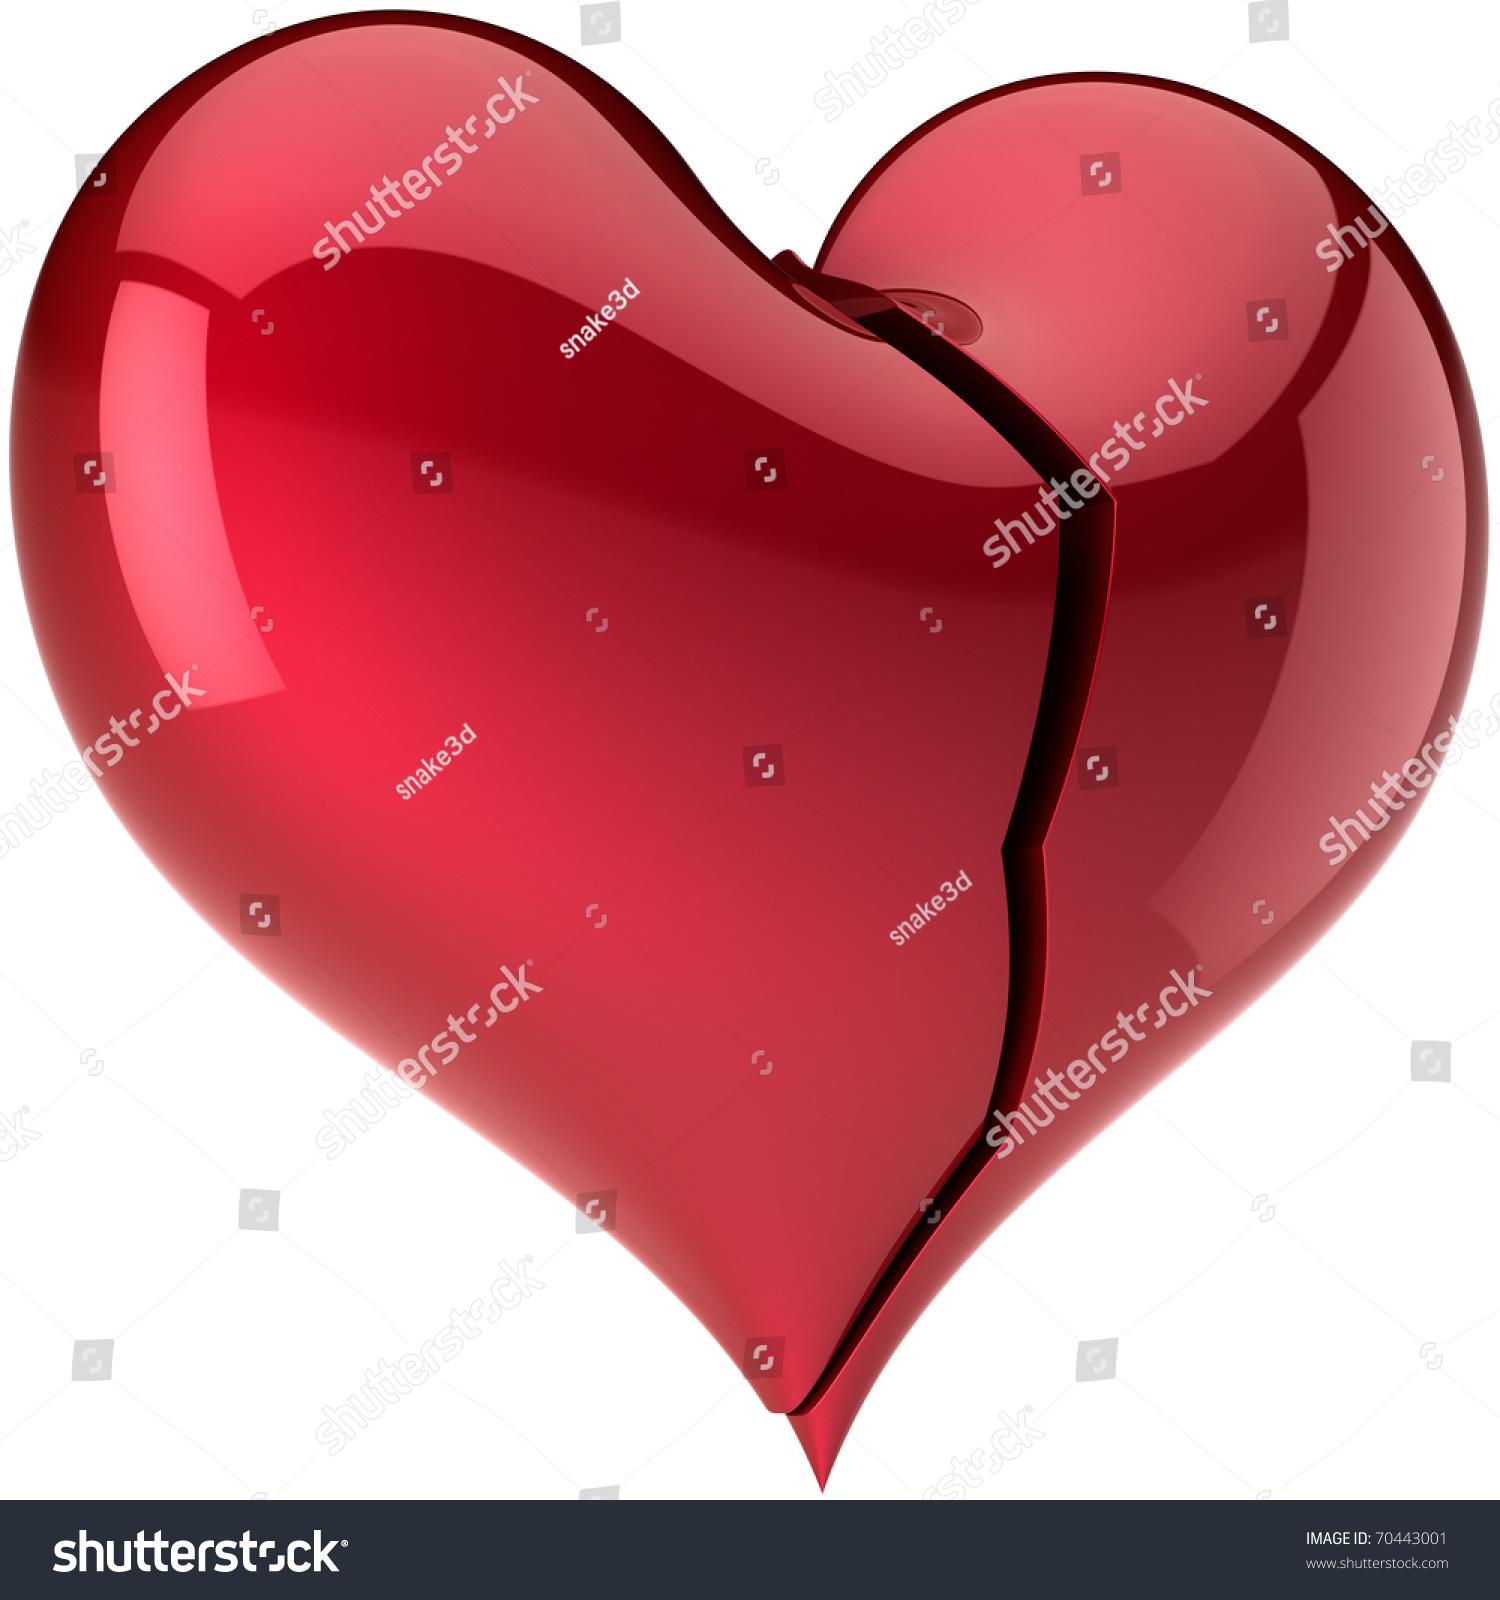 Broken Heart Crack Failure Love Composition Stock Illustration